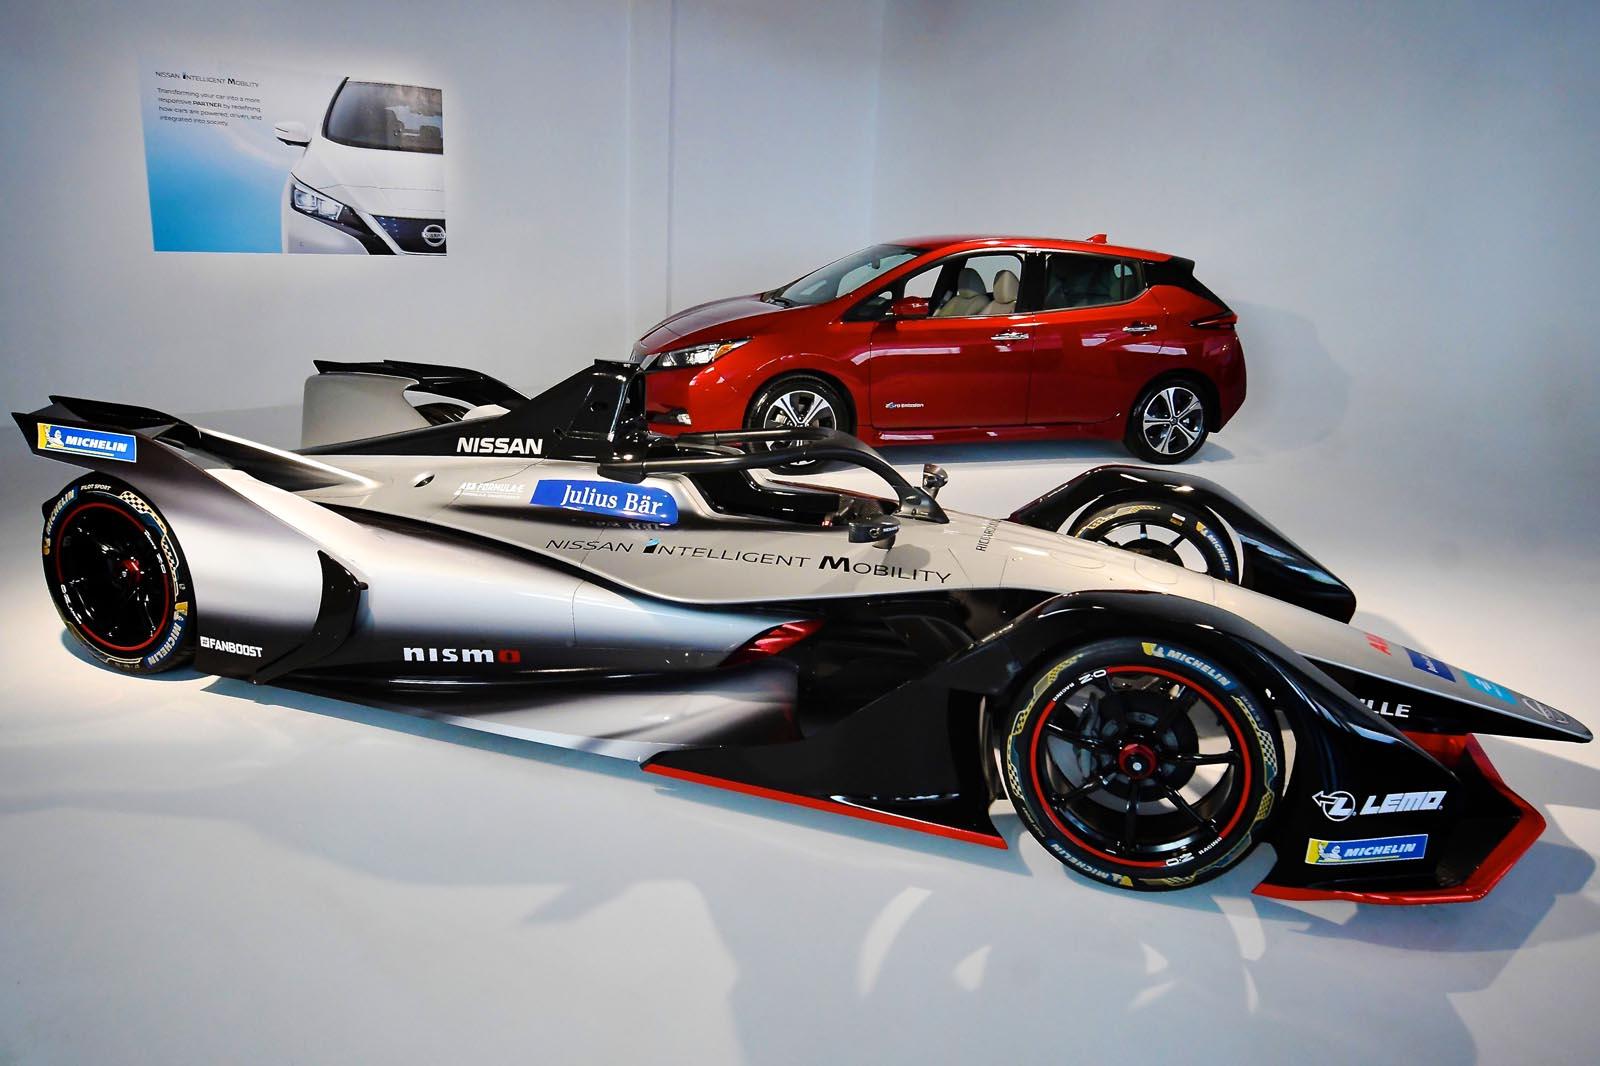 Photo of Αντίστροφη μέτρηση για το ντεμπούτο της  Nissan στην Formula E